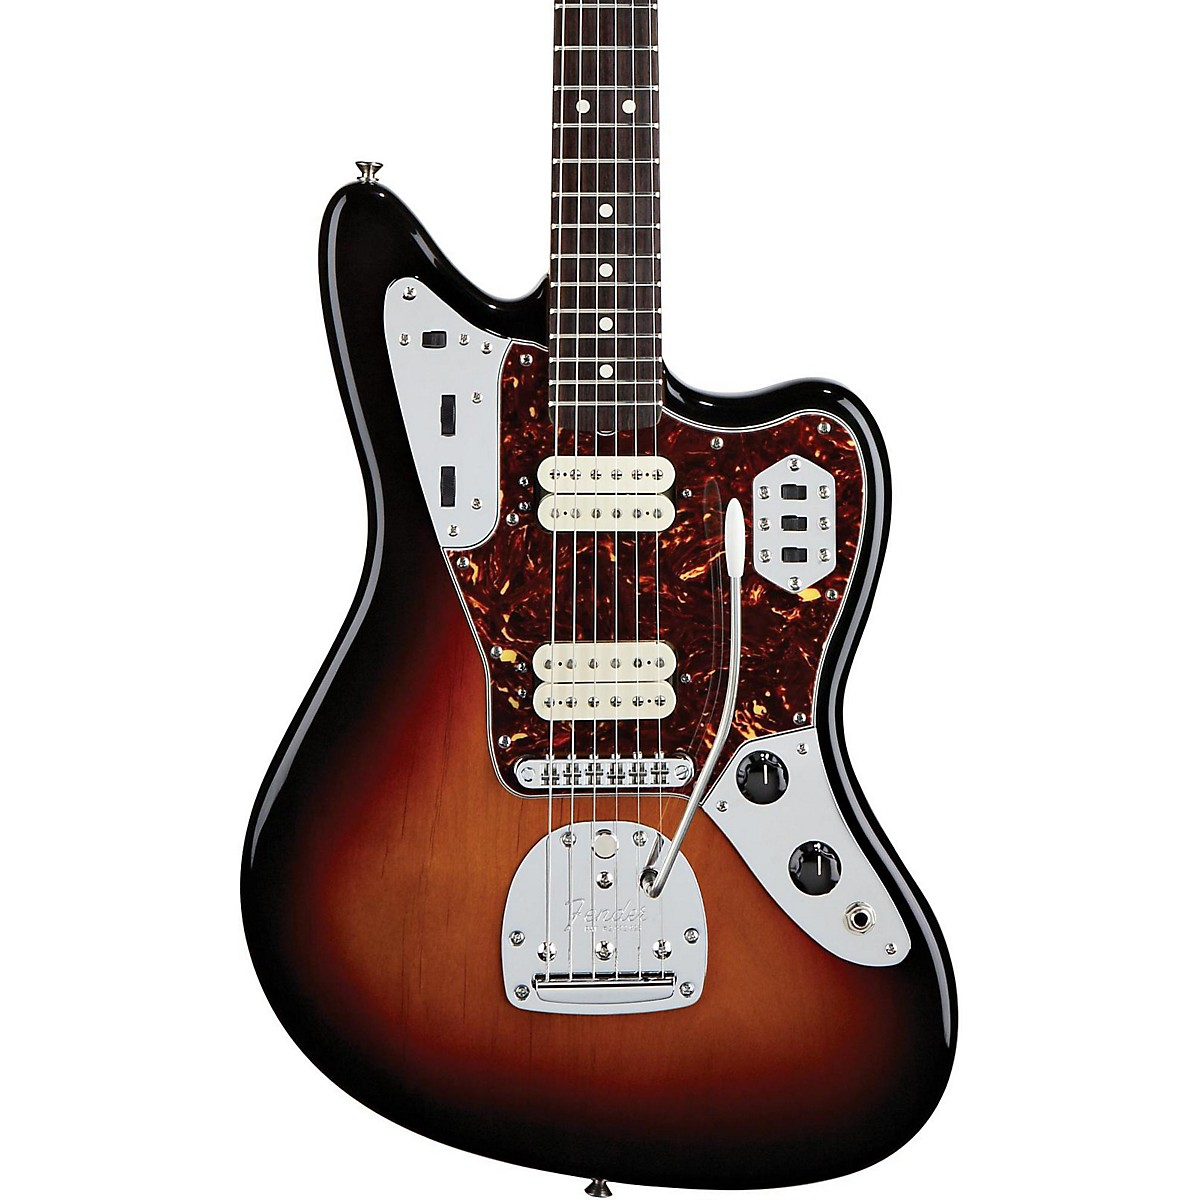 Fender Classic Player Jaguar Special HH Electric Guitar | Guitar CenterGuitar Center